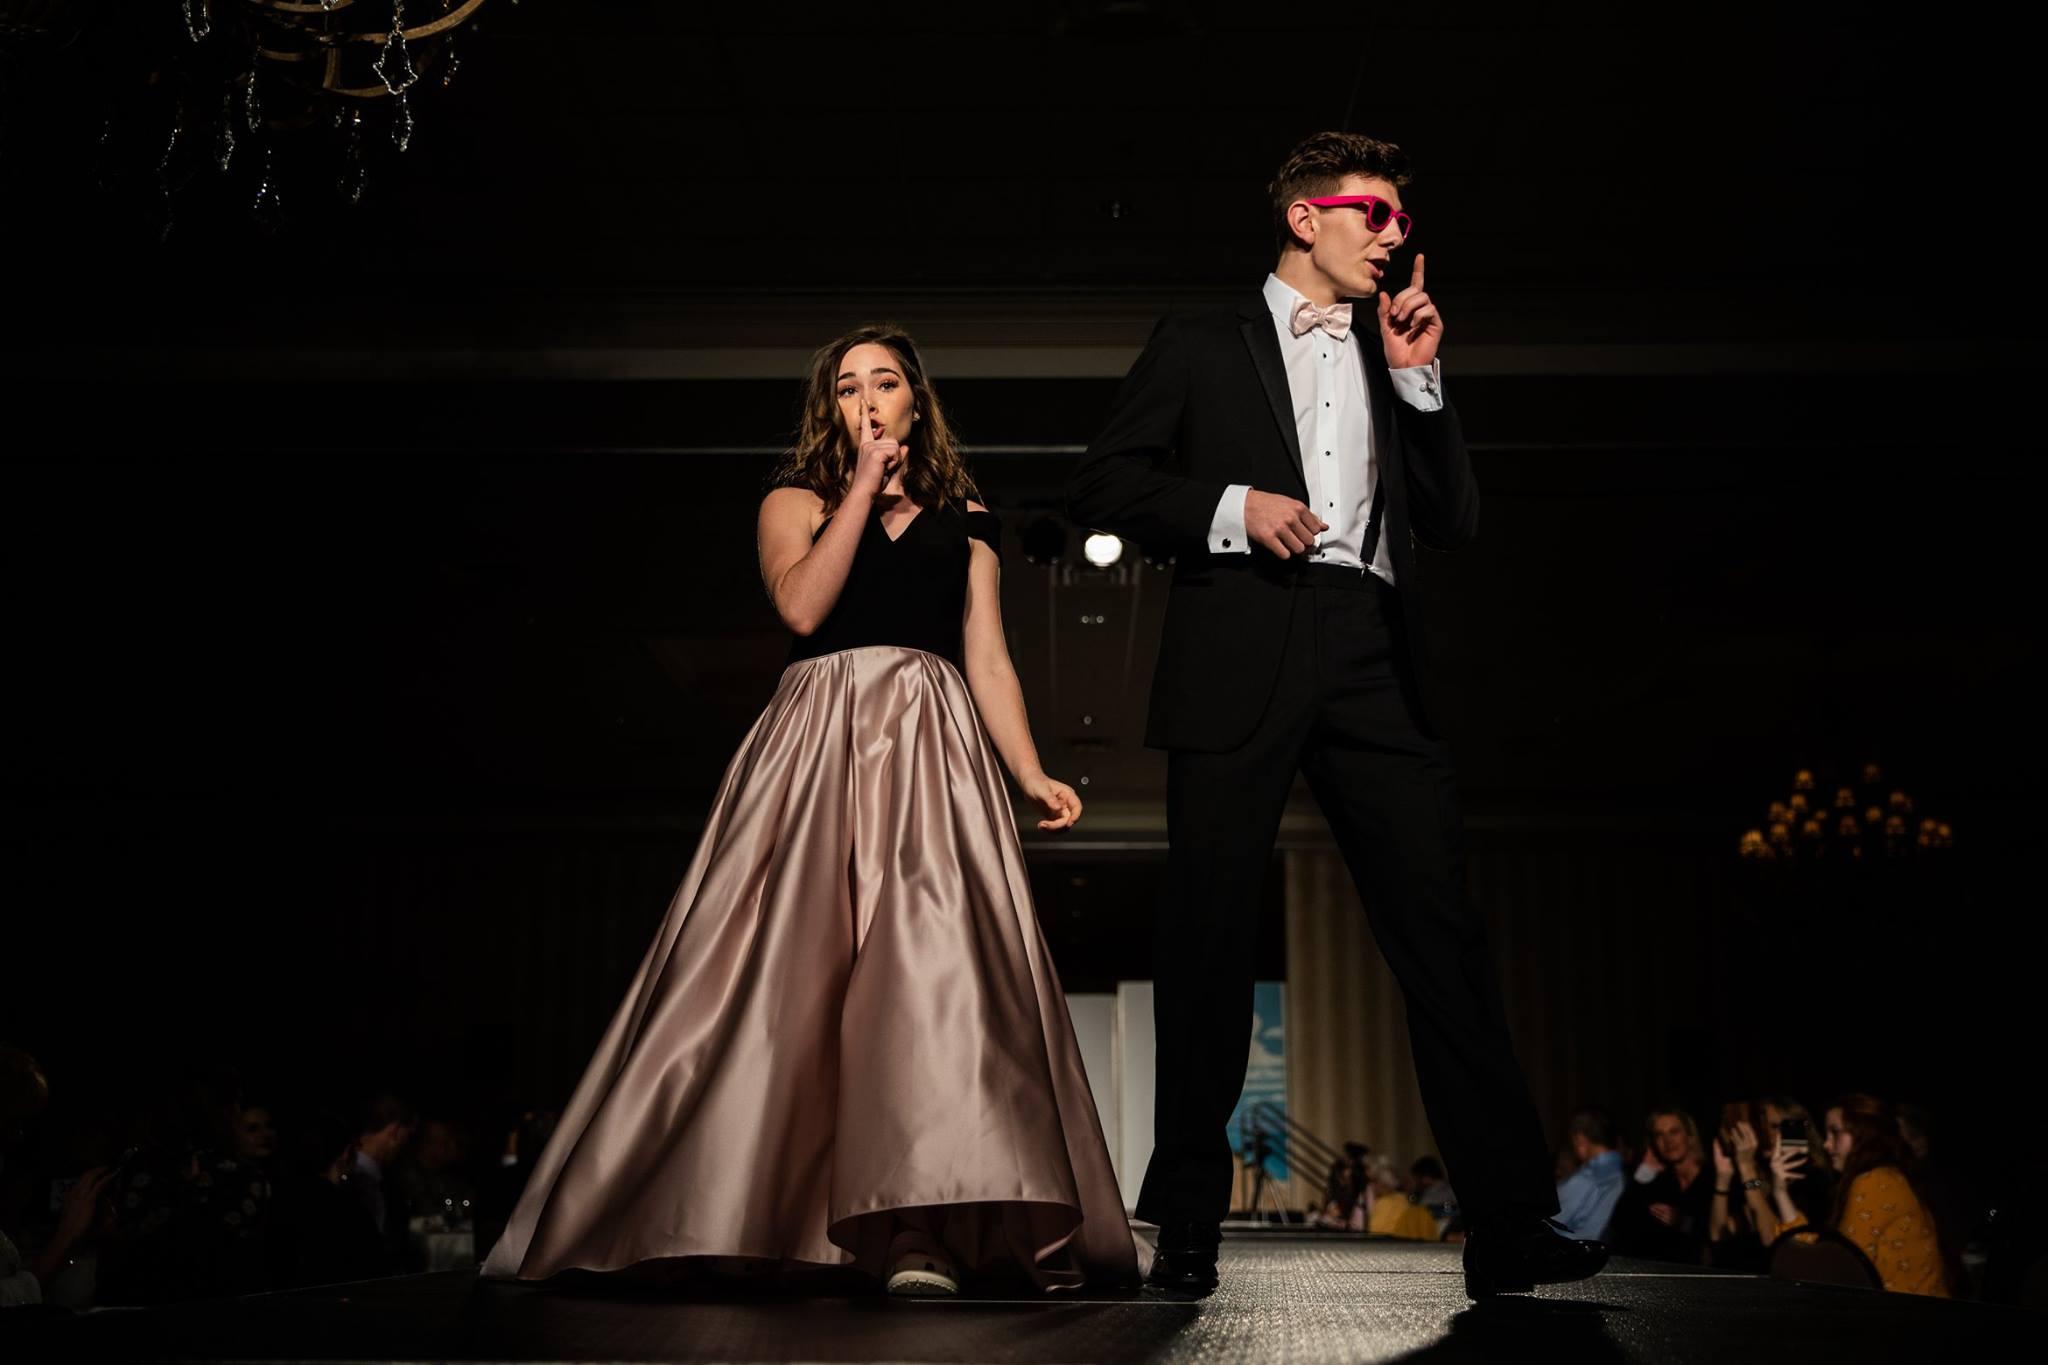 Lutheran_North_High_School_Macomb_Michigan_LHN_Fashion_Show_2019_Seniors (73).jpg